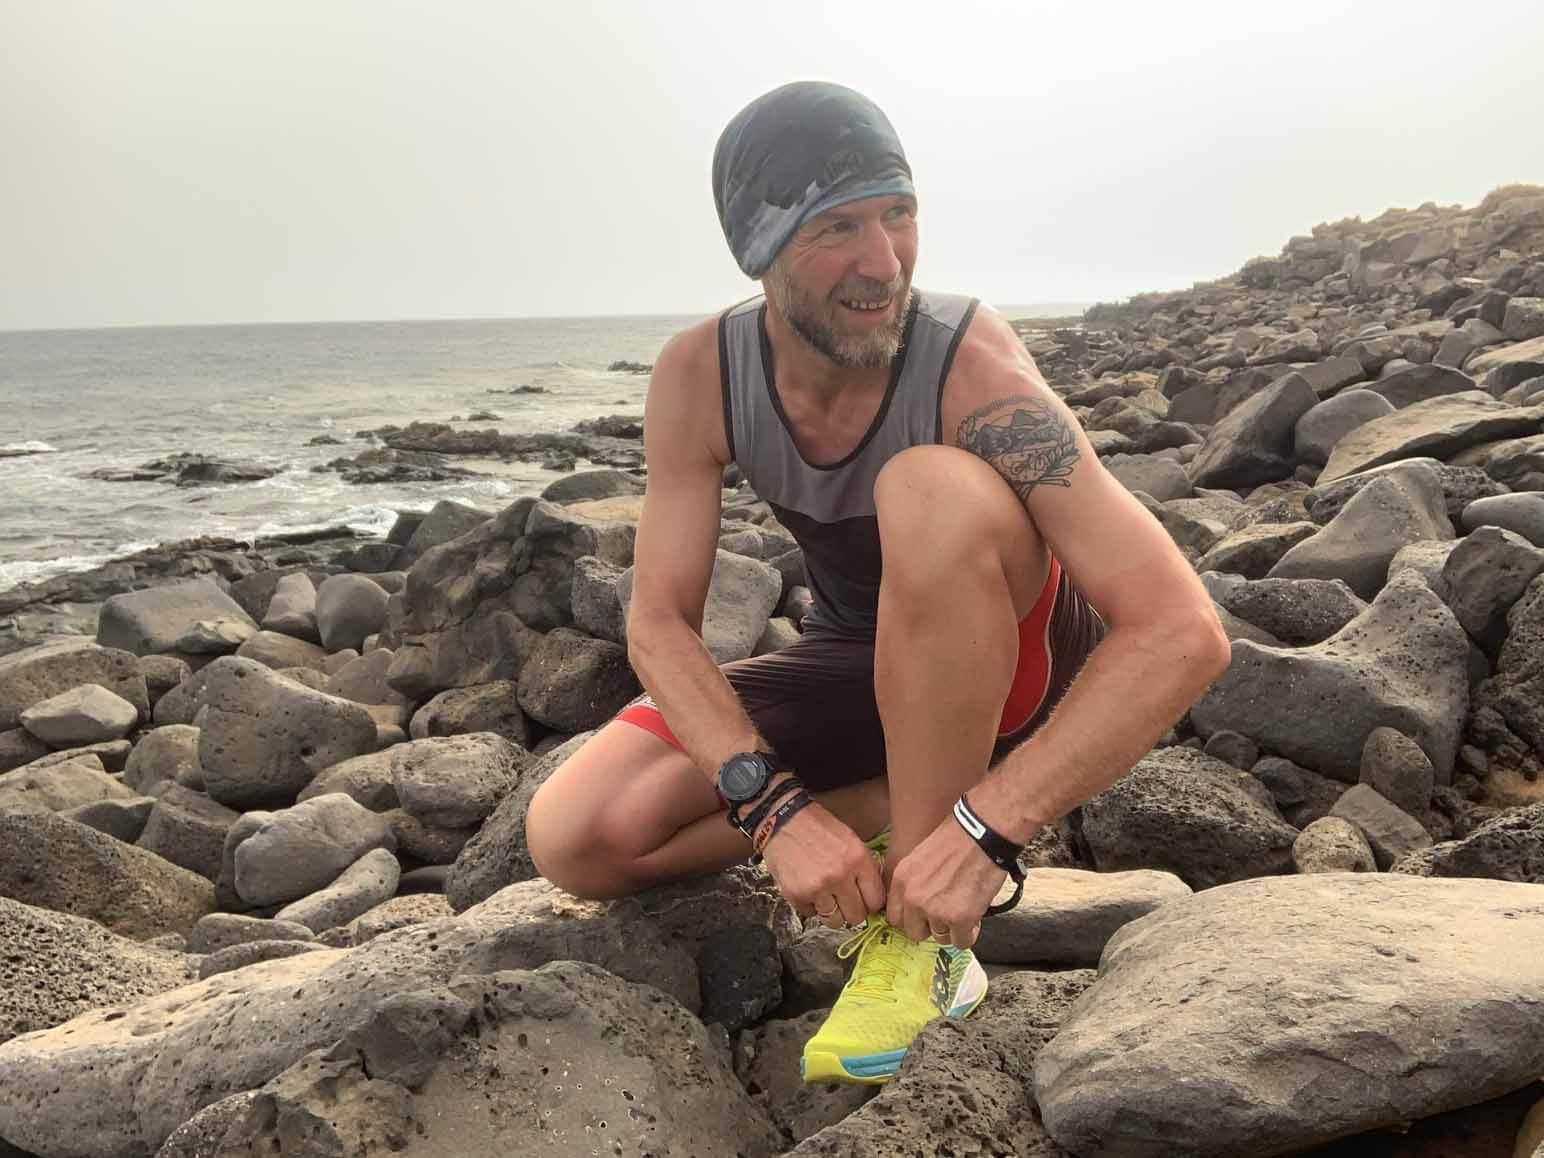 HOKA fan Tom Pullinger tied up his Carbon Rocket shoelaces